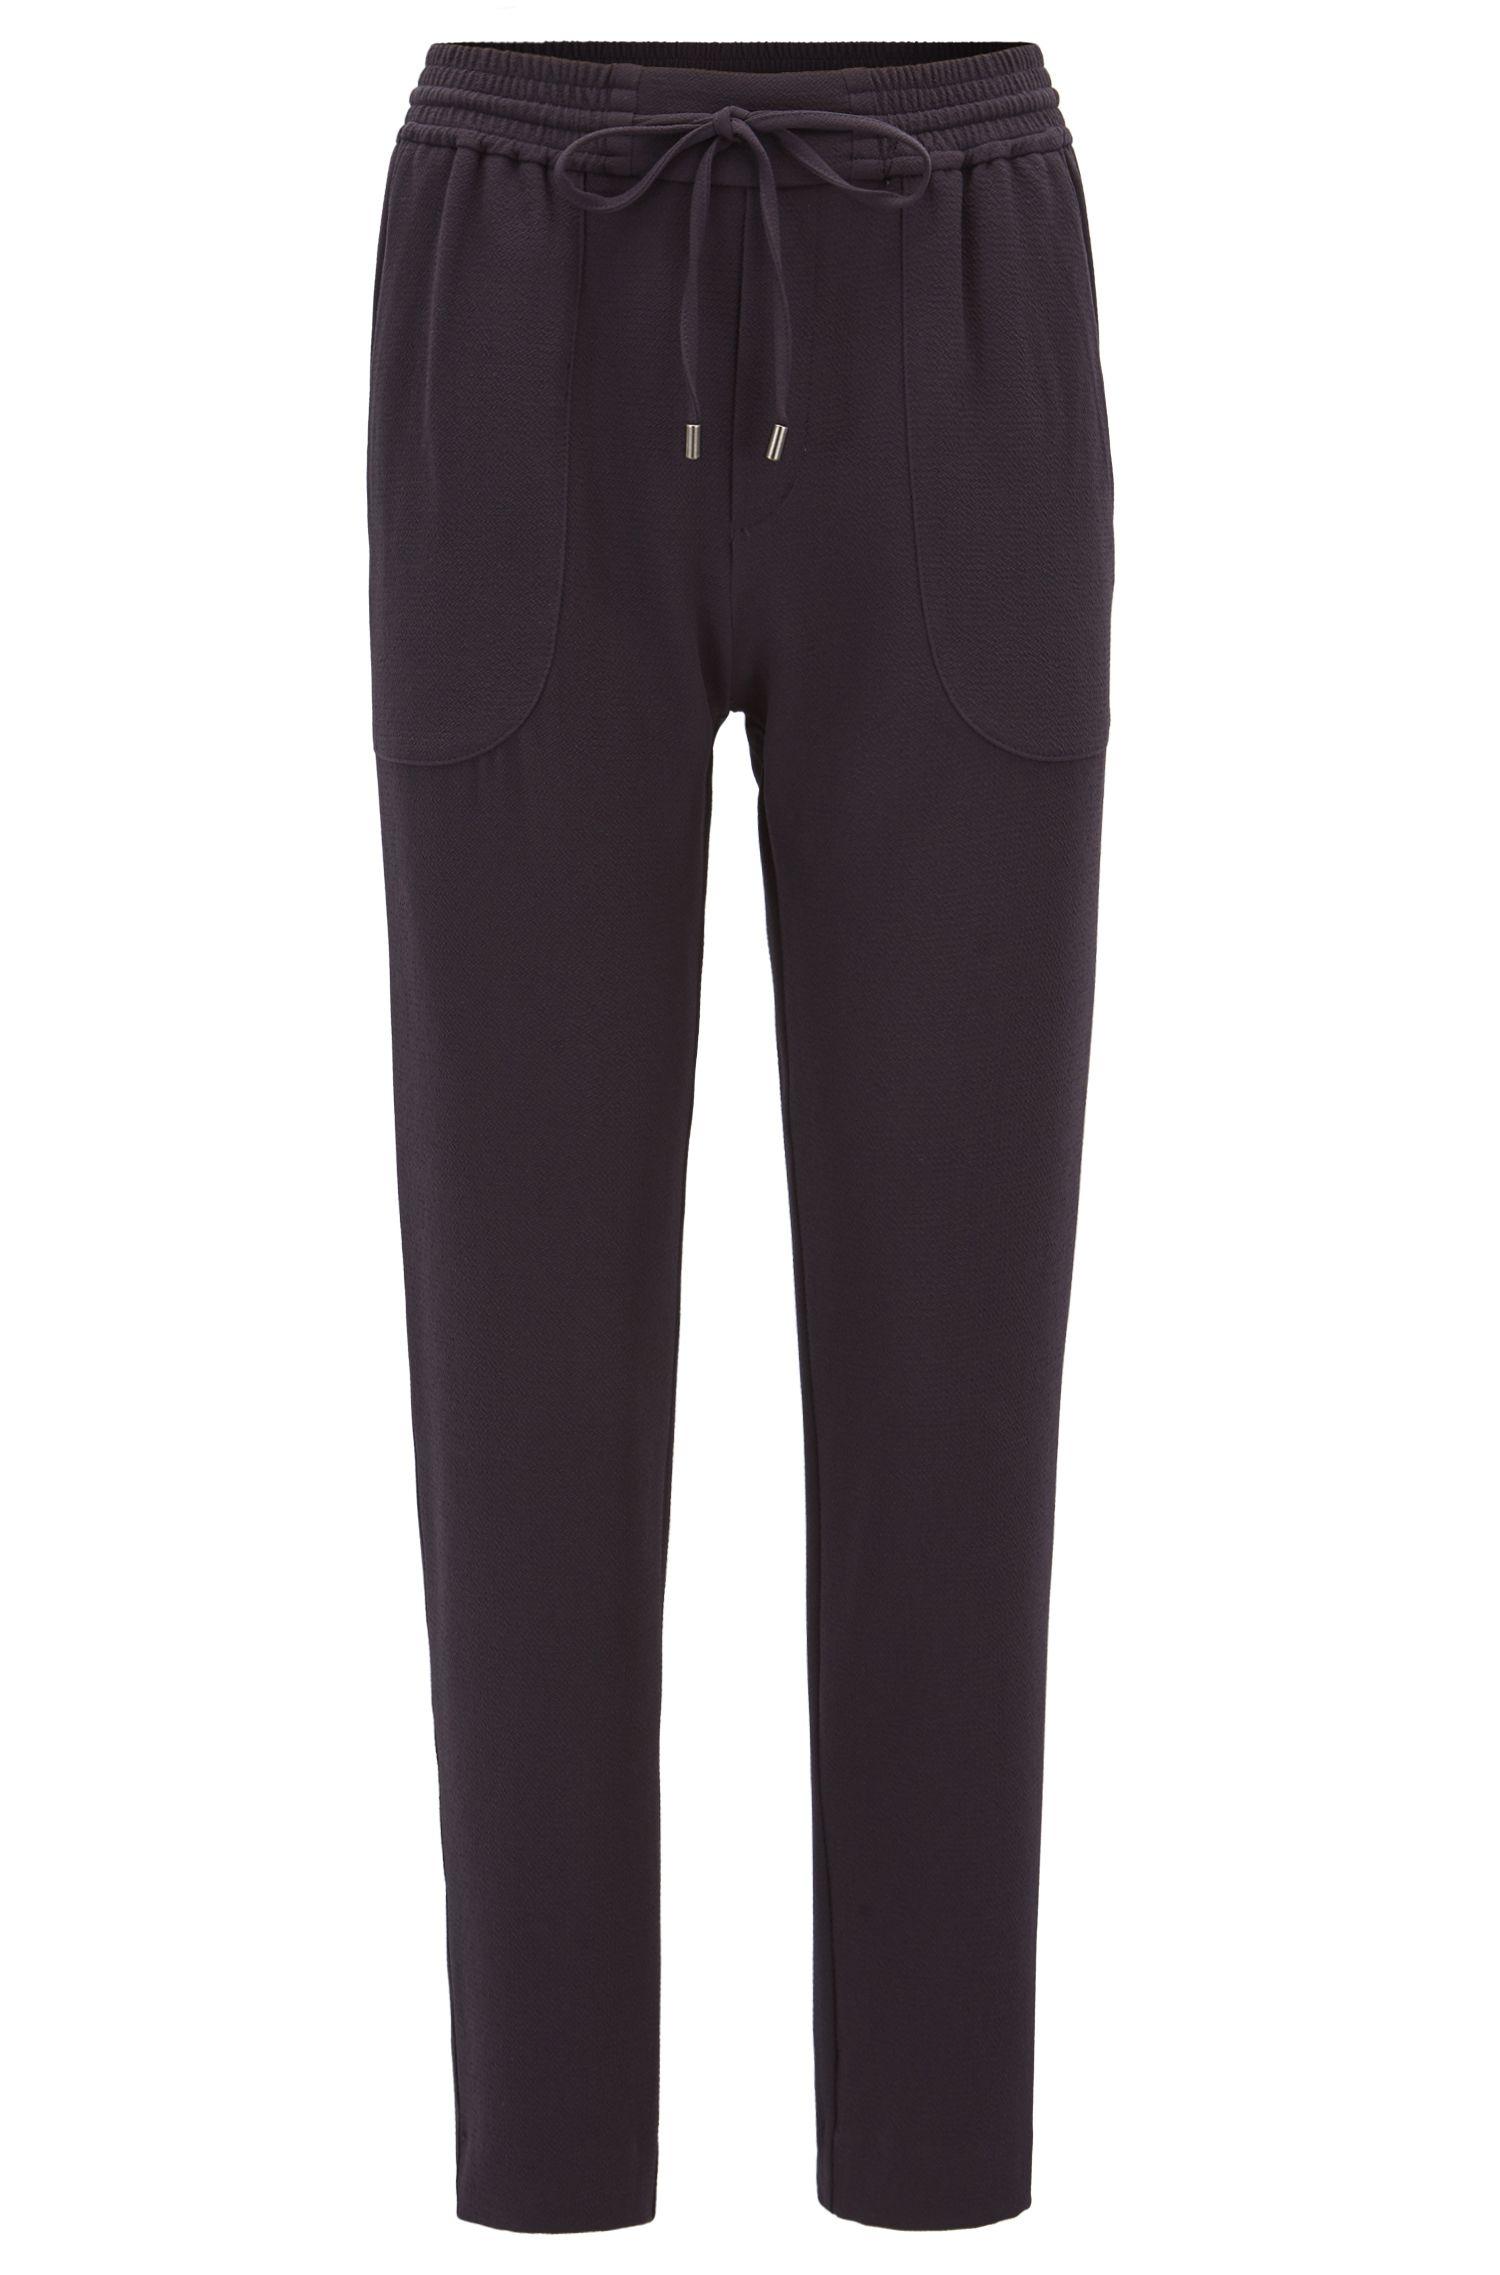 Pantalon Relaxed Fit avec cordon de serrage en crêpe froissé stretch